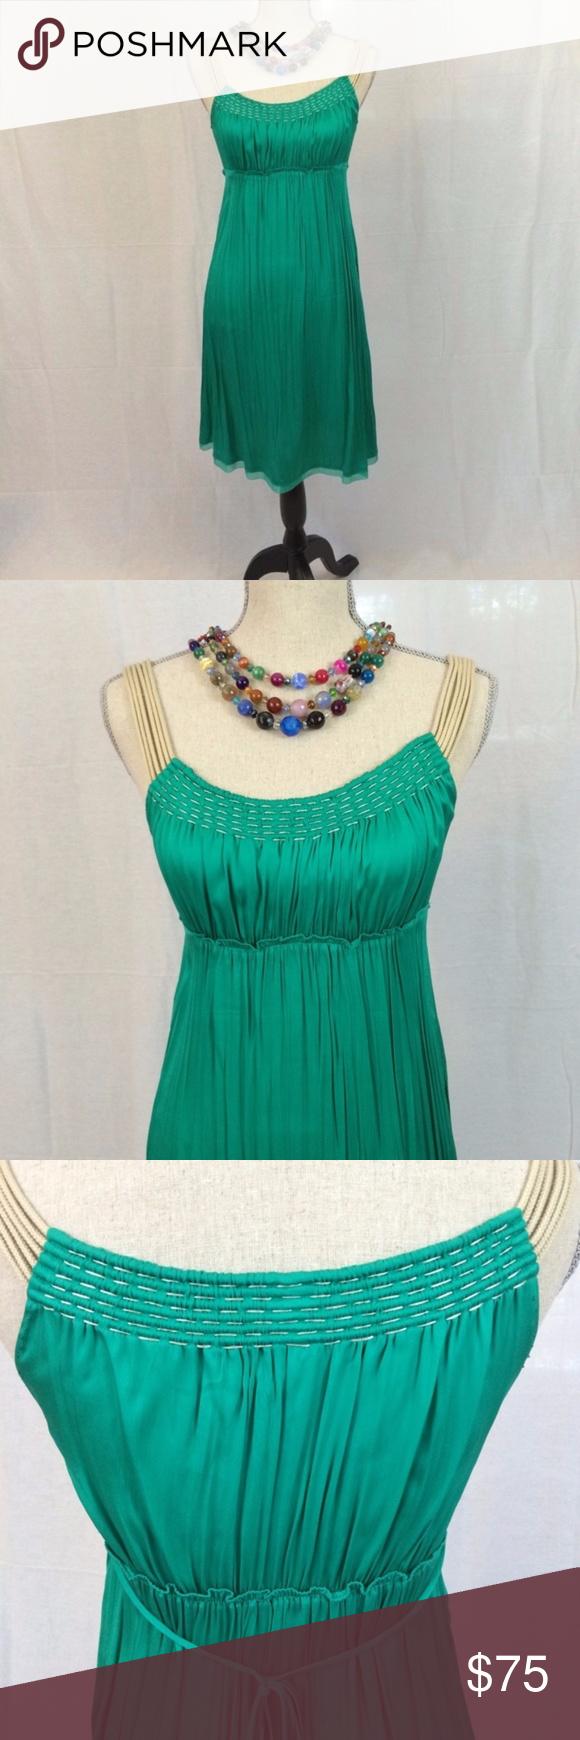 b603a325d385 Elie Tahari Emerald Green Silk Dress Sz 4 Wear this beautiful emerald green silk  dress to a wedding, as a day to evening dress, or on date night!